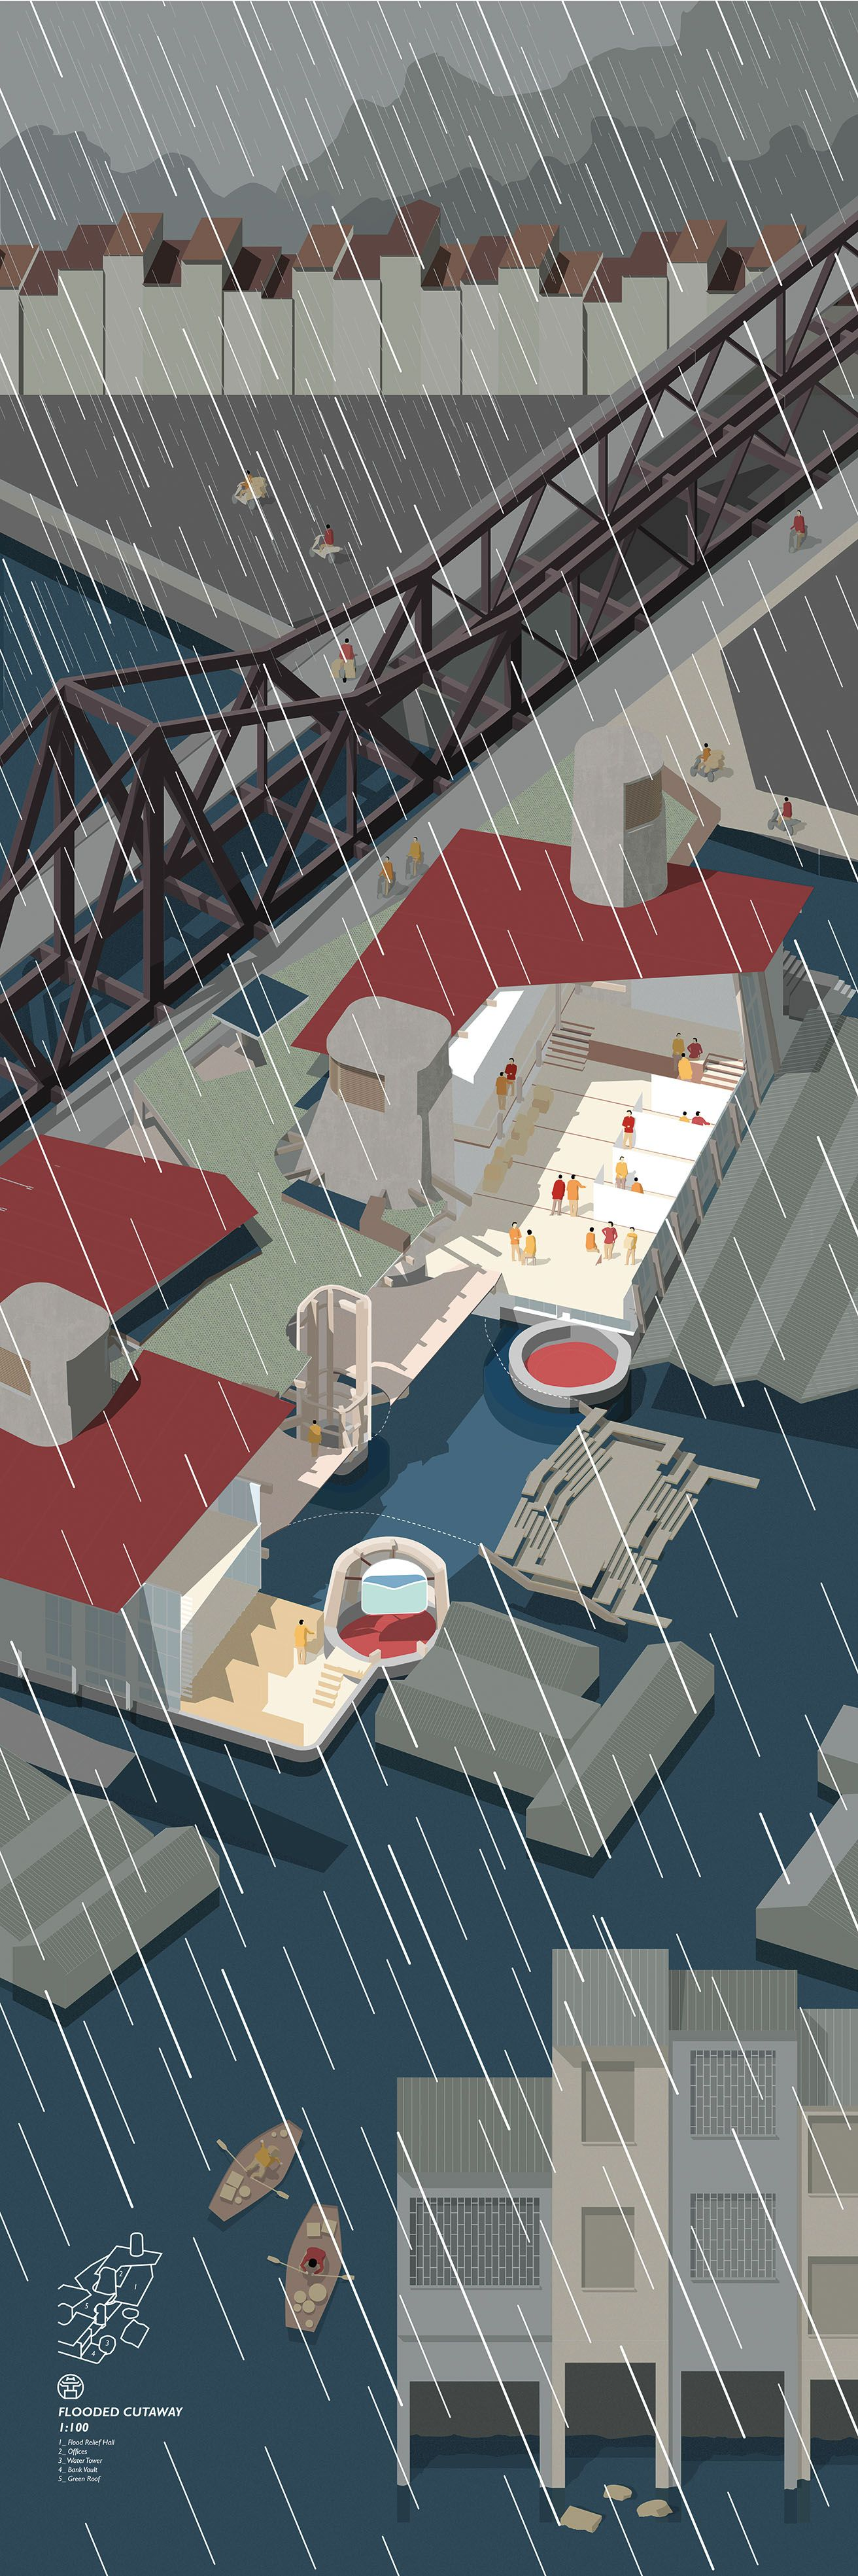 Picture Book Illustration Making An Architectural Model: Jamie Hignett, Bartlett School Of Arhcitecture, Unit 1